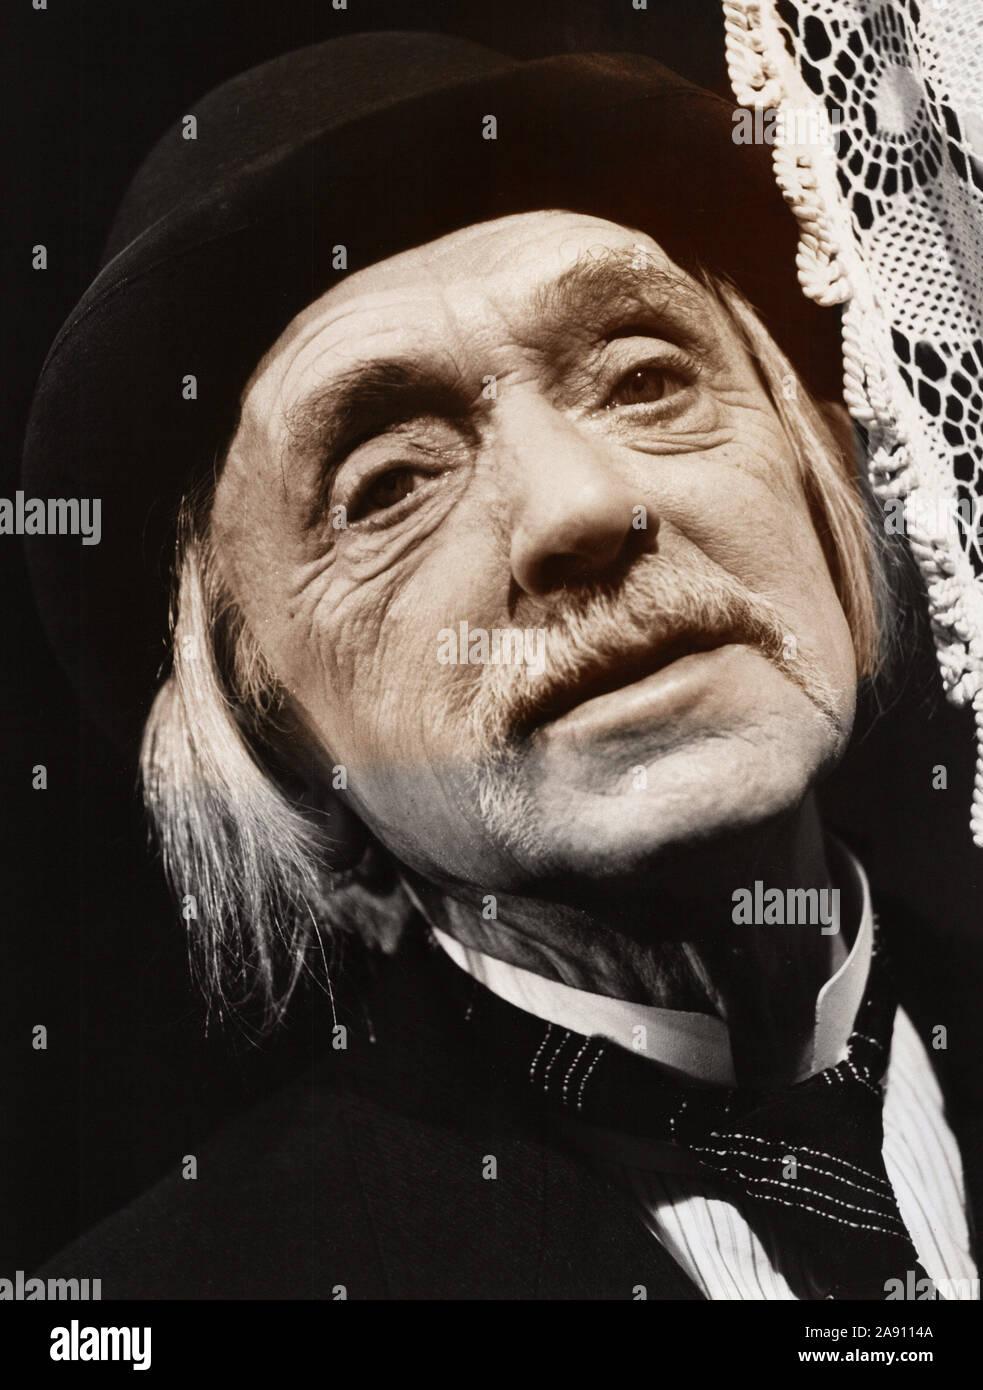 Walter Bluhm